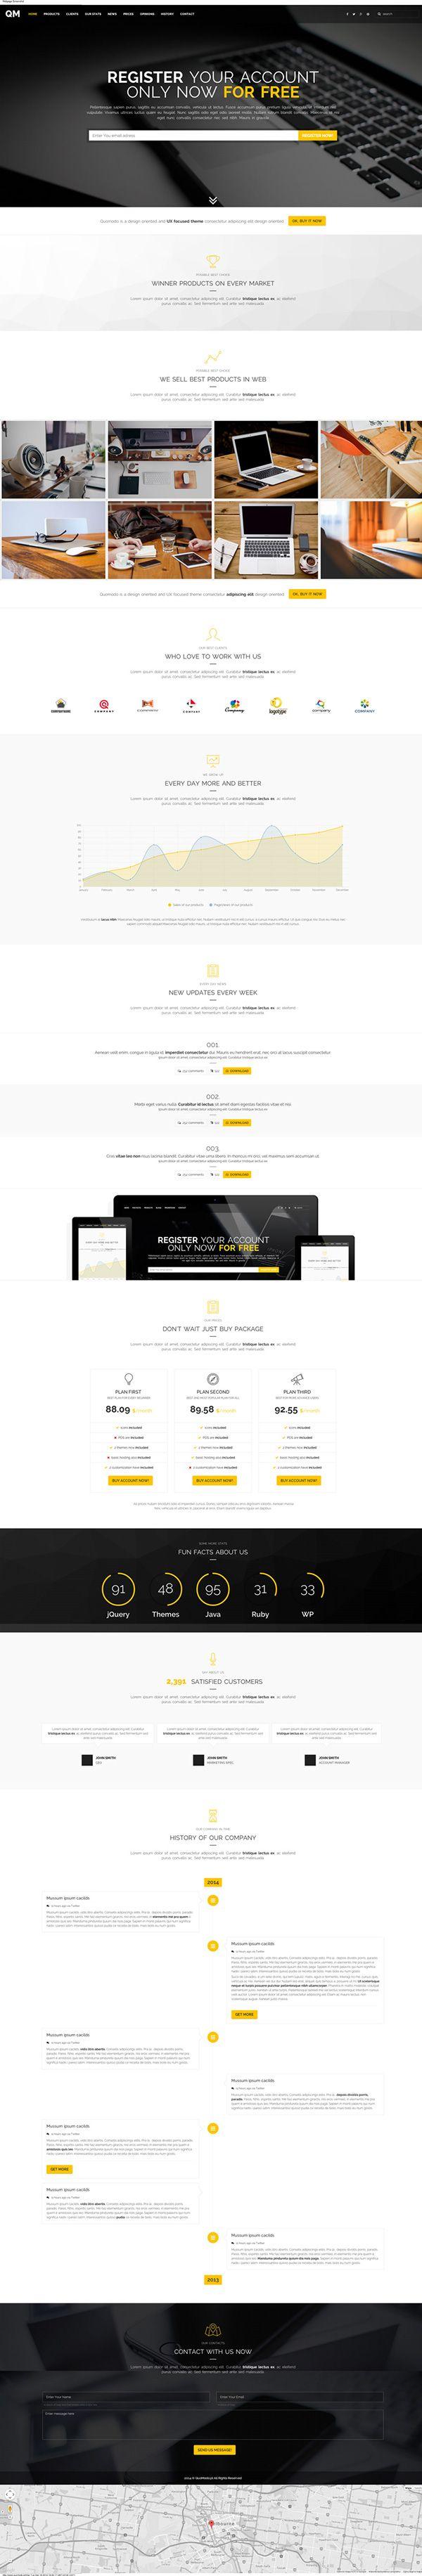 Responsive clean website webdesign . Multipurpose Premium Landing Page Design .  Get it from here - http://themeforest.net/item/multipurpose-landing-page/9768342